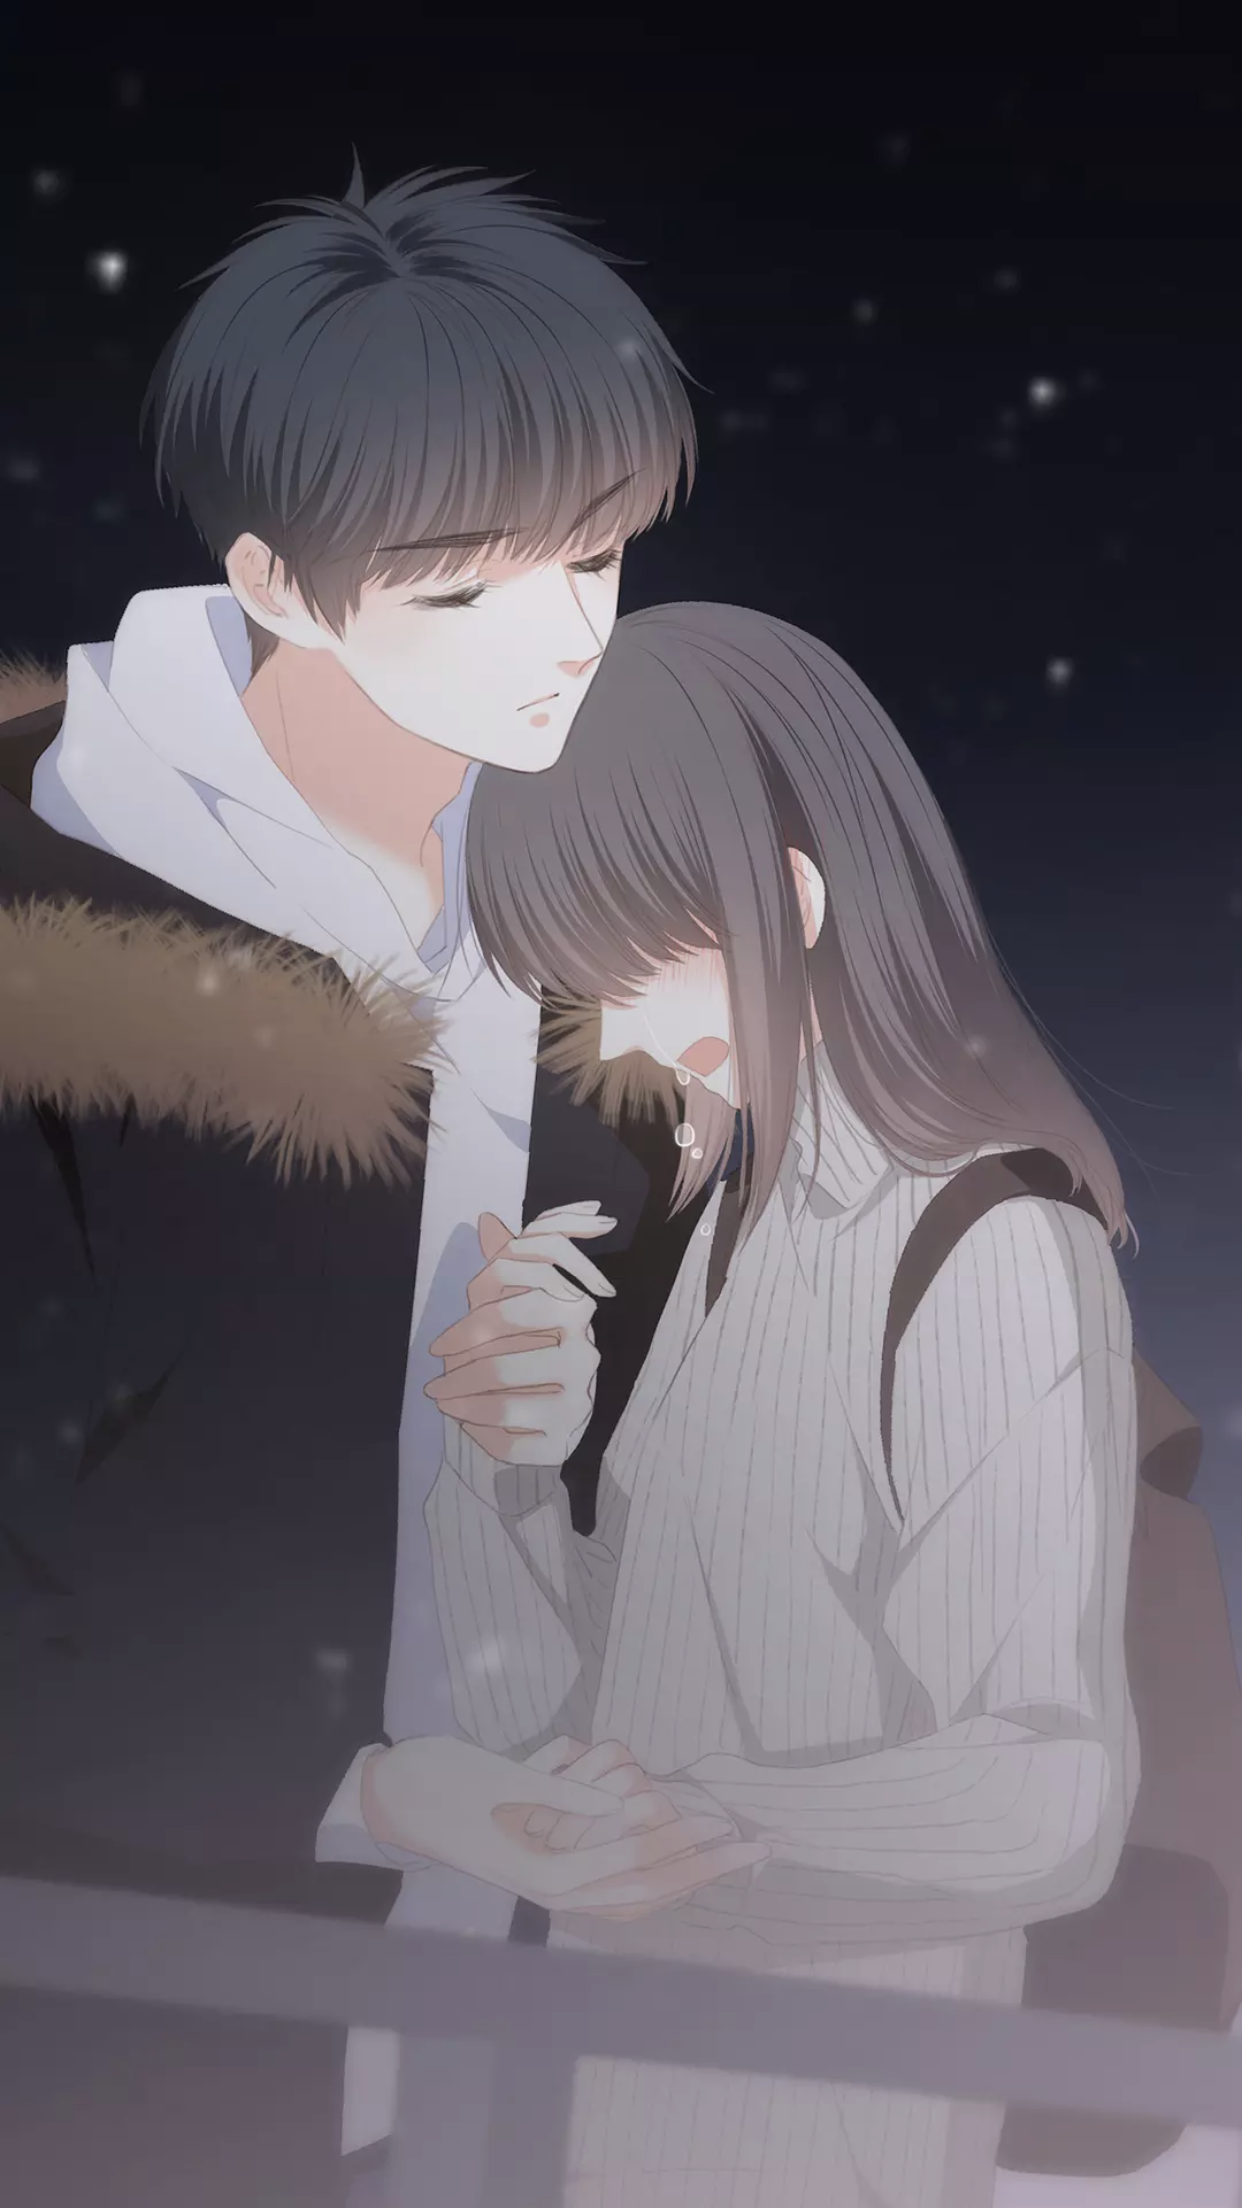 Pin Oleh Amee Skills Di Love Never Fails Manga Pasangan Animasi Gambar Anime Ilustrasi Orang